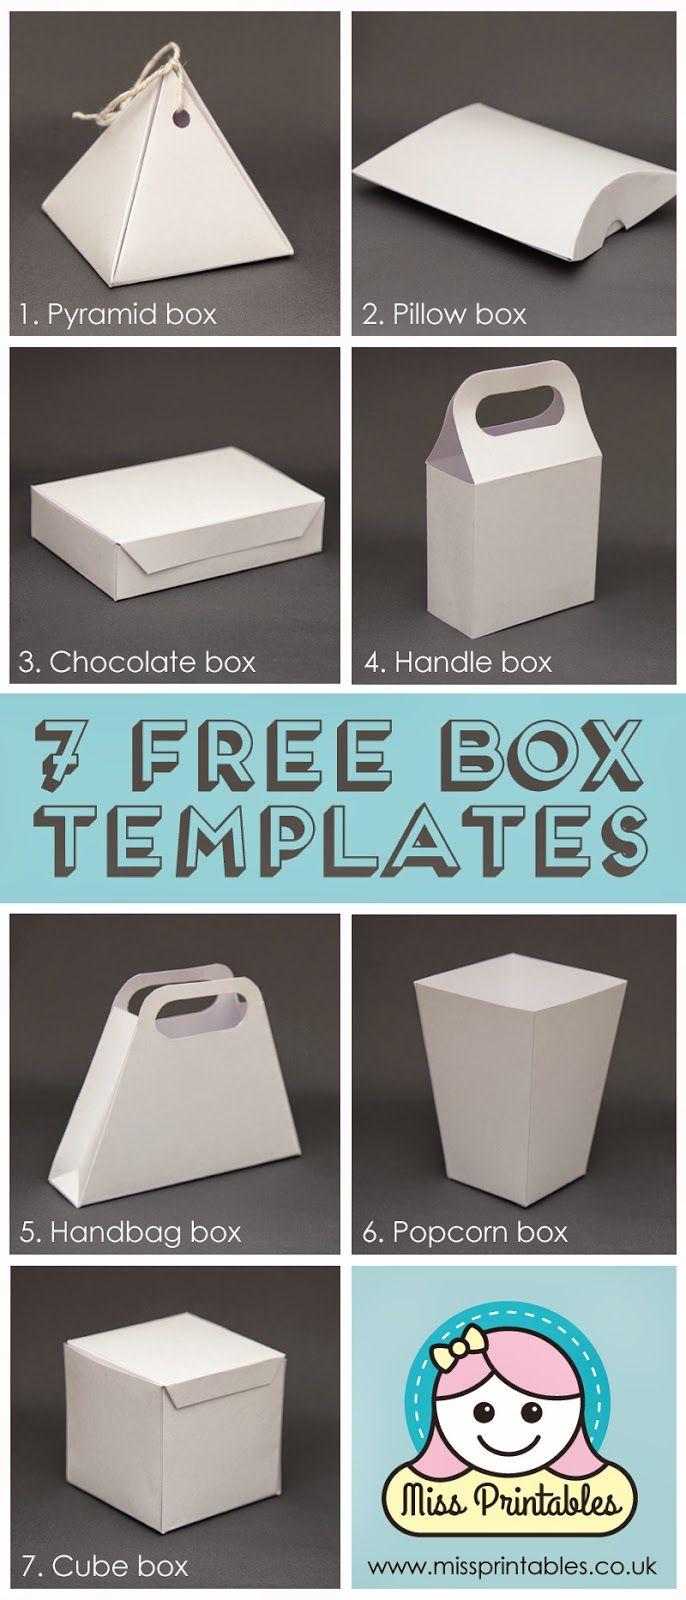 Box Template Free   Templates & Paper Folding   Pinterest   Diy Gift - Gift Box Templates Free Printable